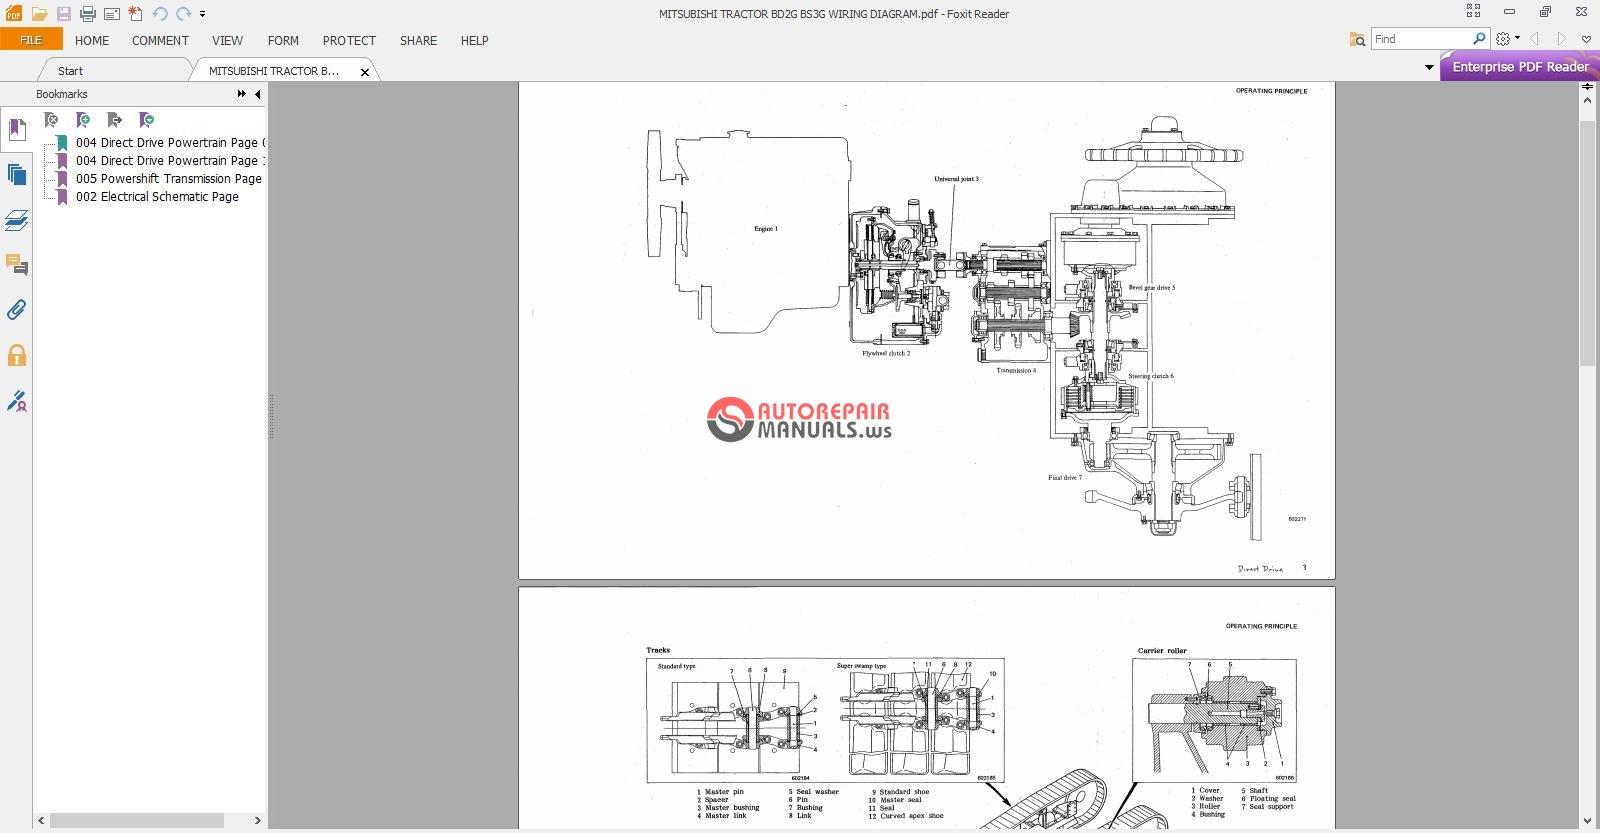 hight resolution of mitsubishi tractor bd2g bs3g wiring diagram auto repair mitsubishi tractor parts diagram mitsubishi compact tractor 4x4